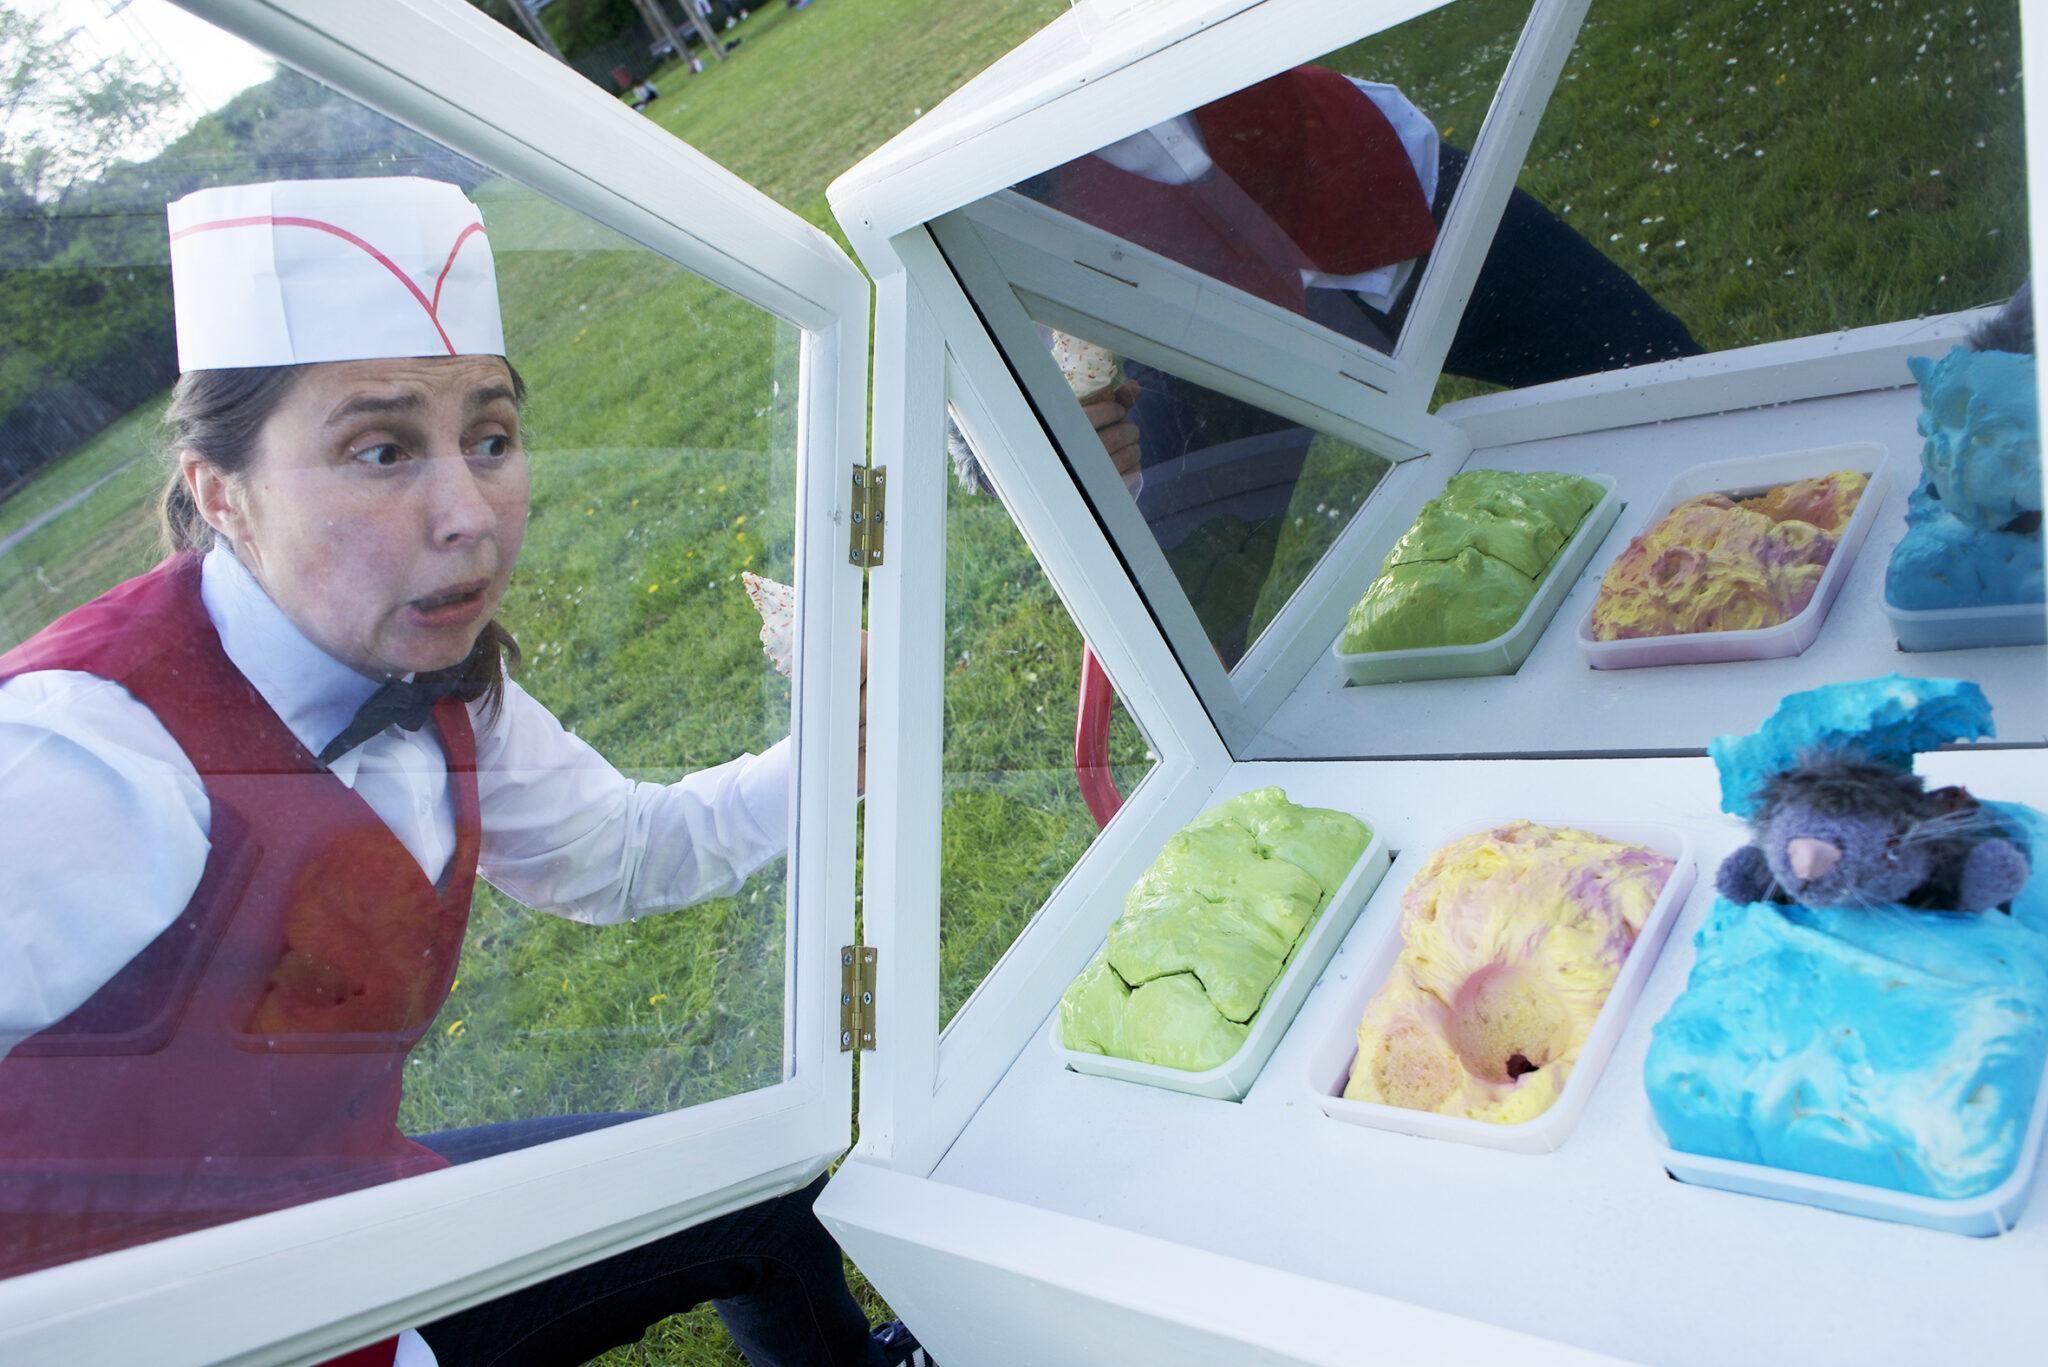 Lice cream seller looking at Ice Creams